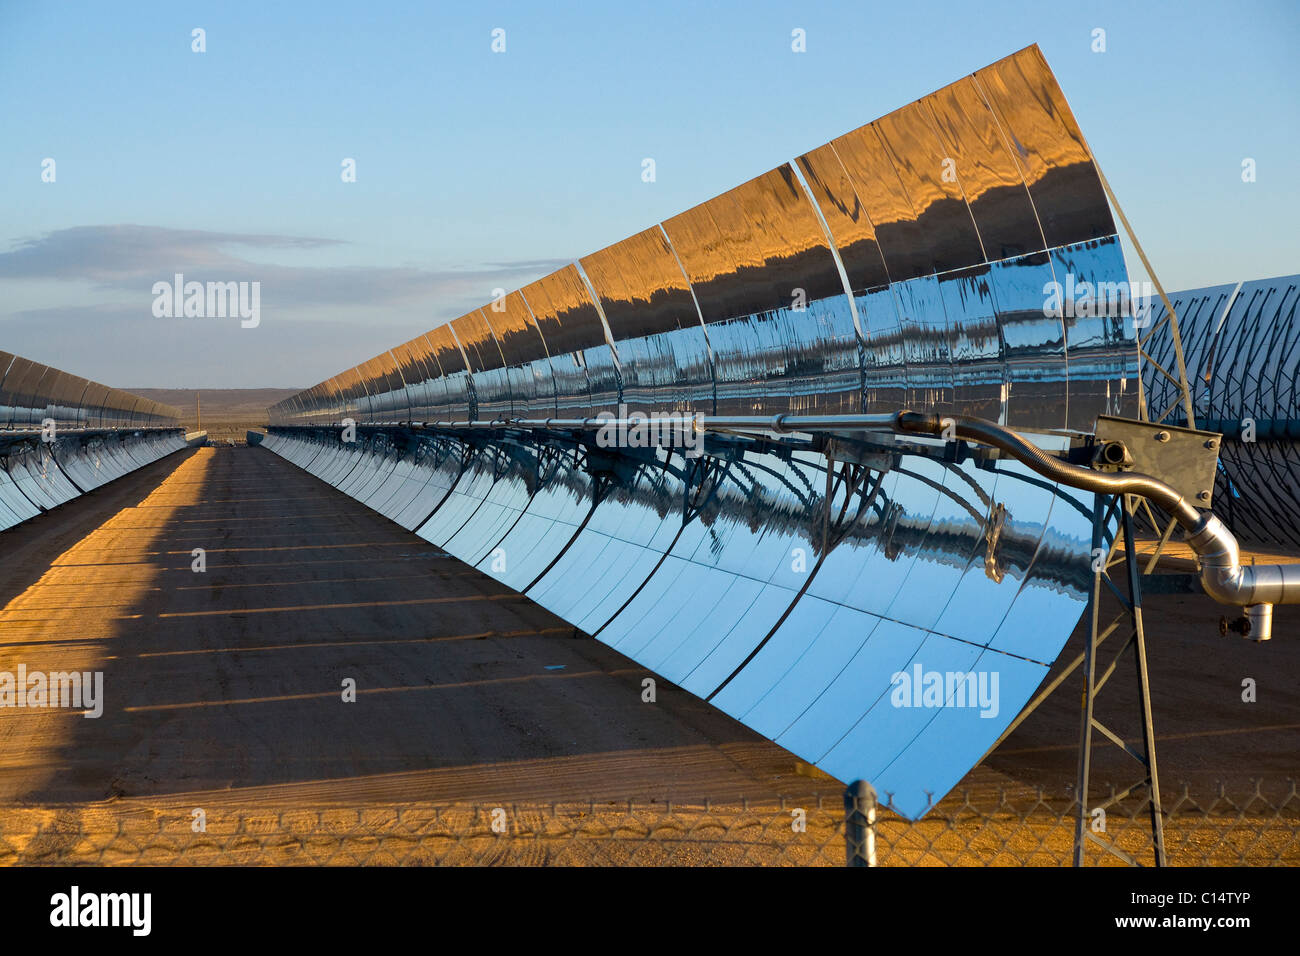 A solar power plant - Stock Image